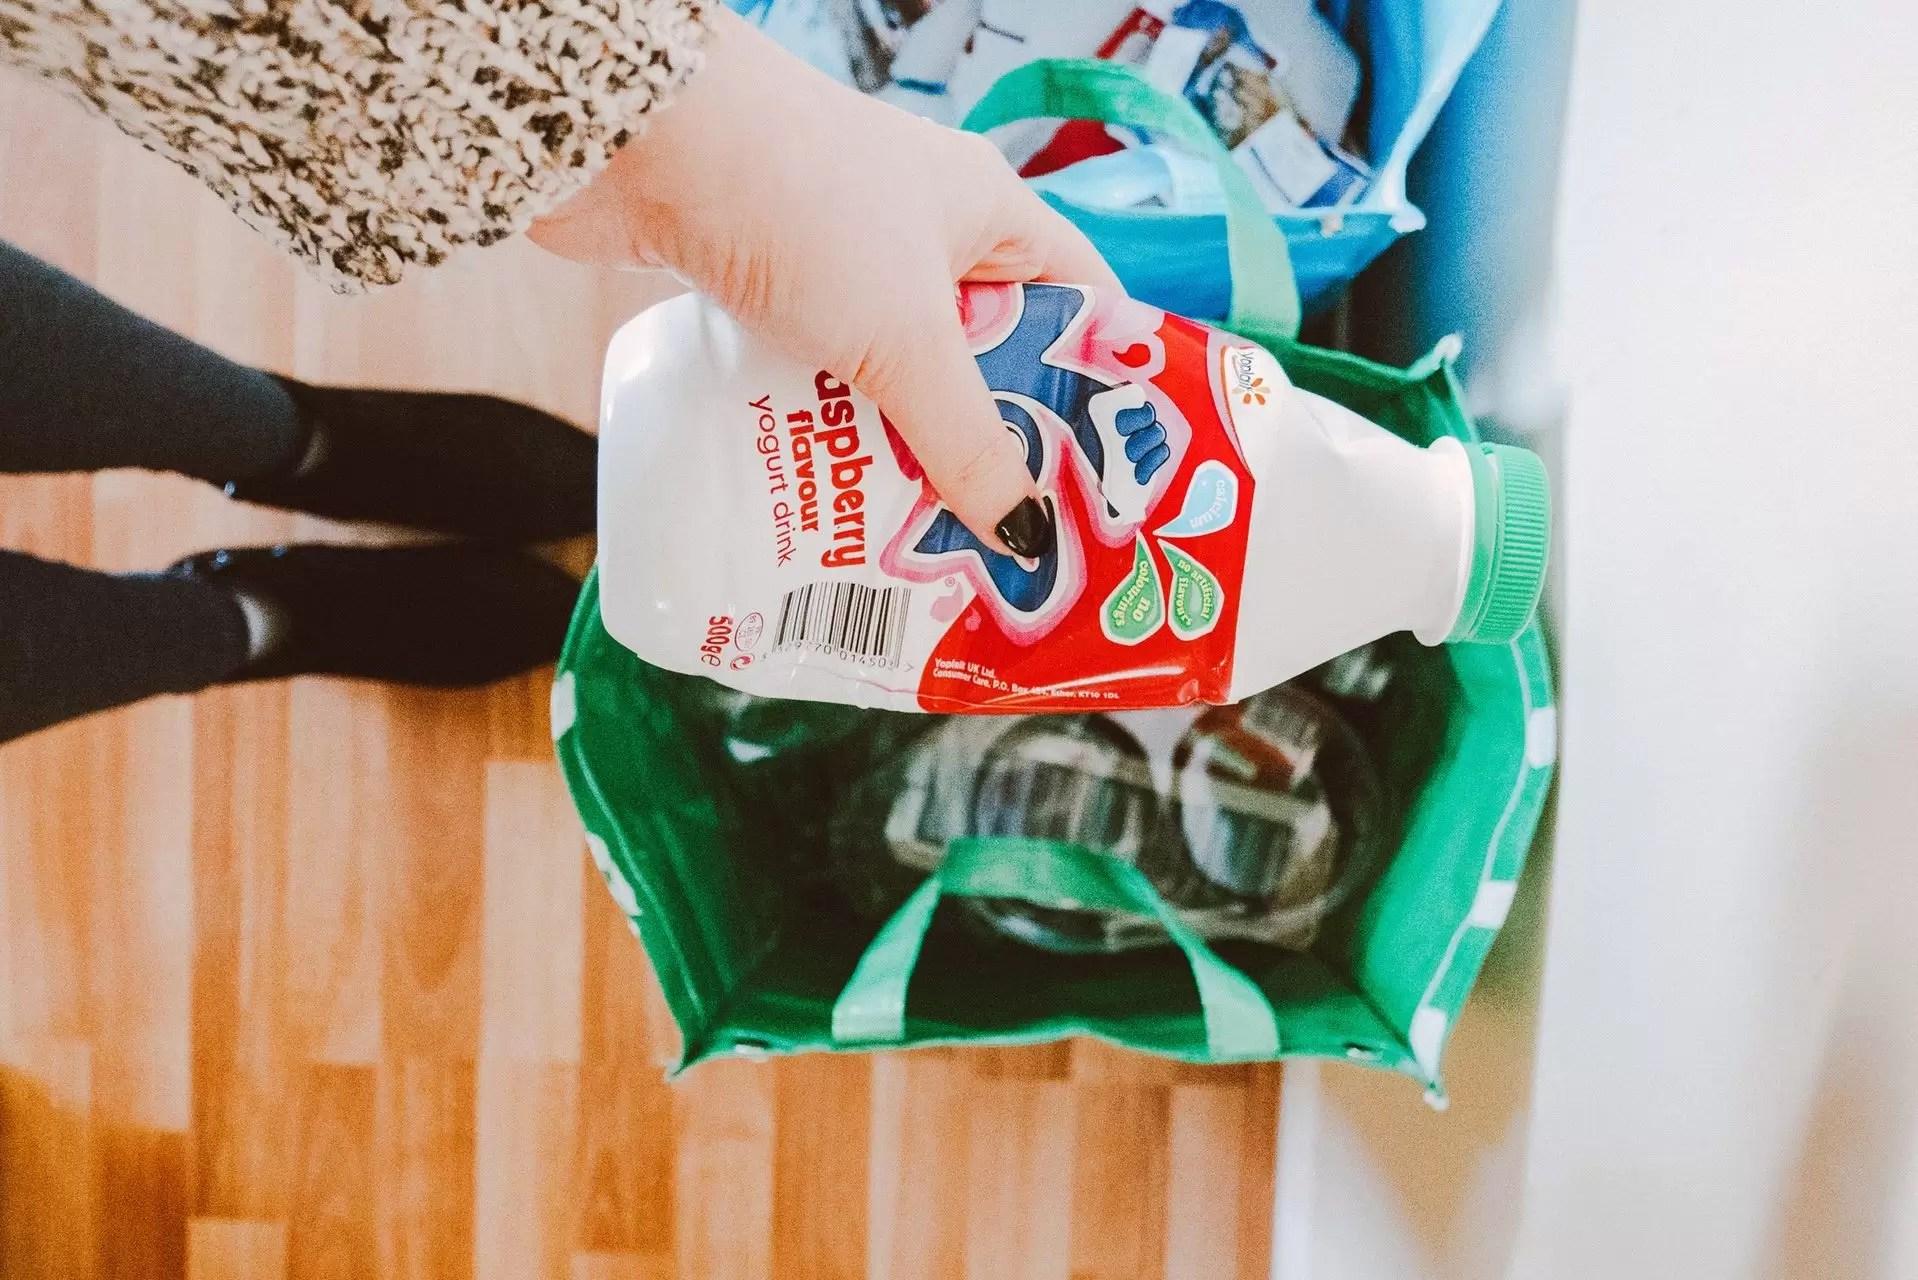 reduzir plástico